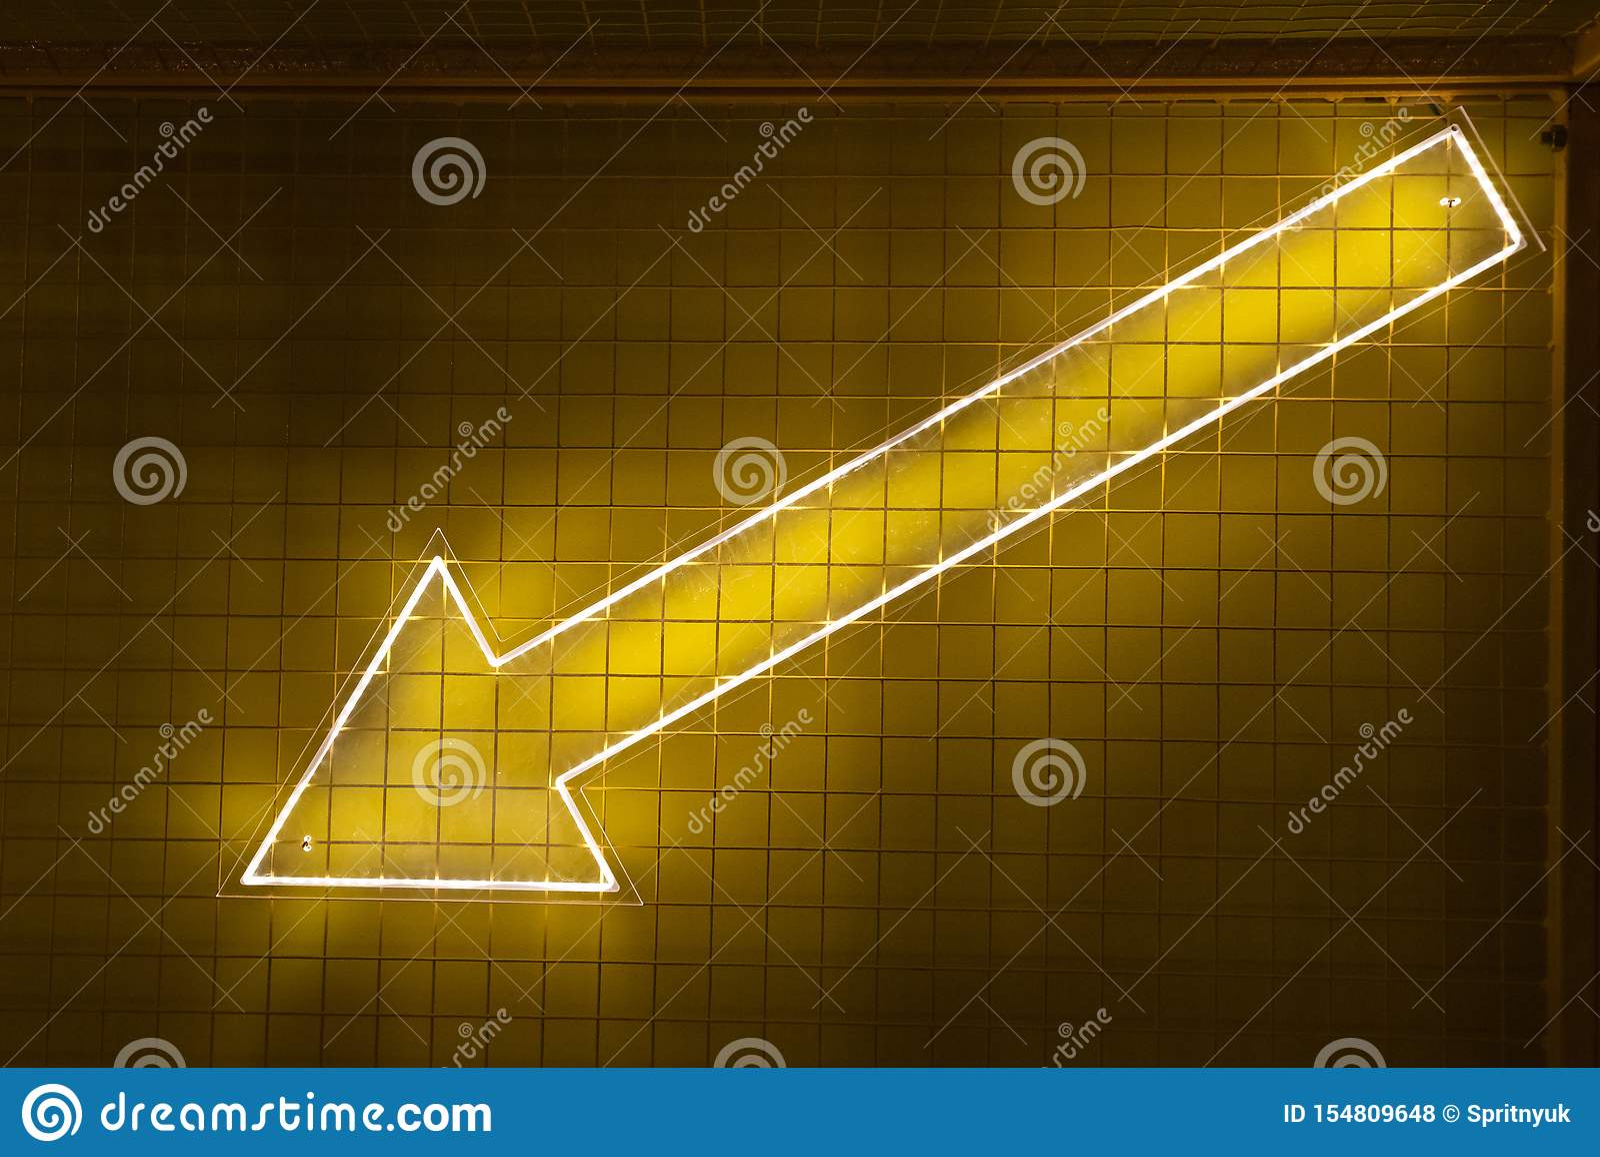 Dots matrix led diplay panel with illuminated symbol of arrow